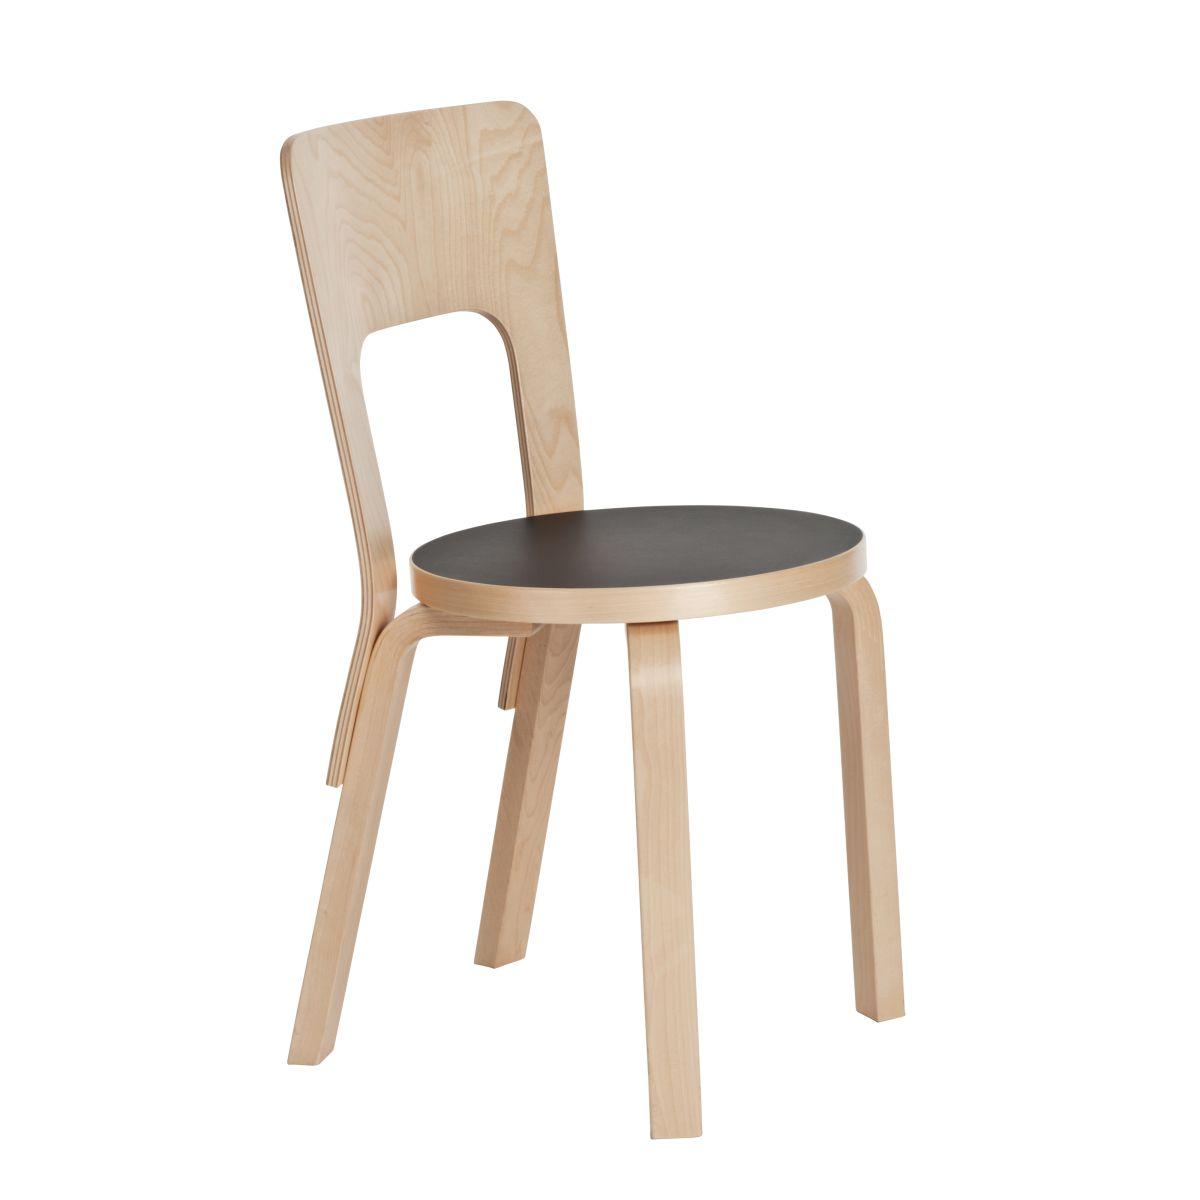 Chair 66 clear lacquer black linoleum